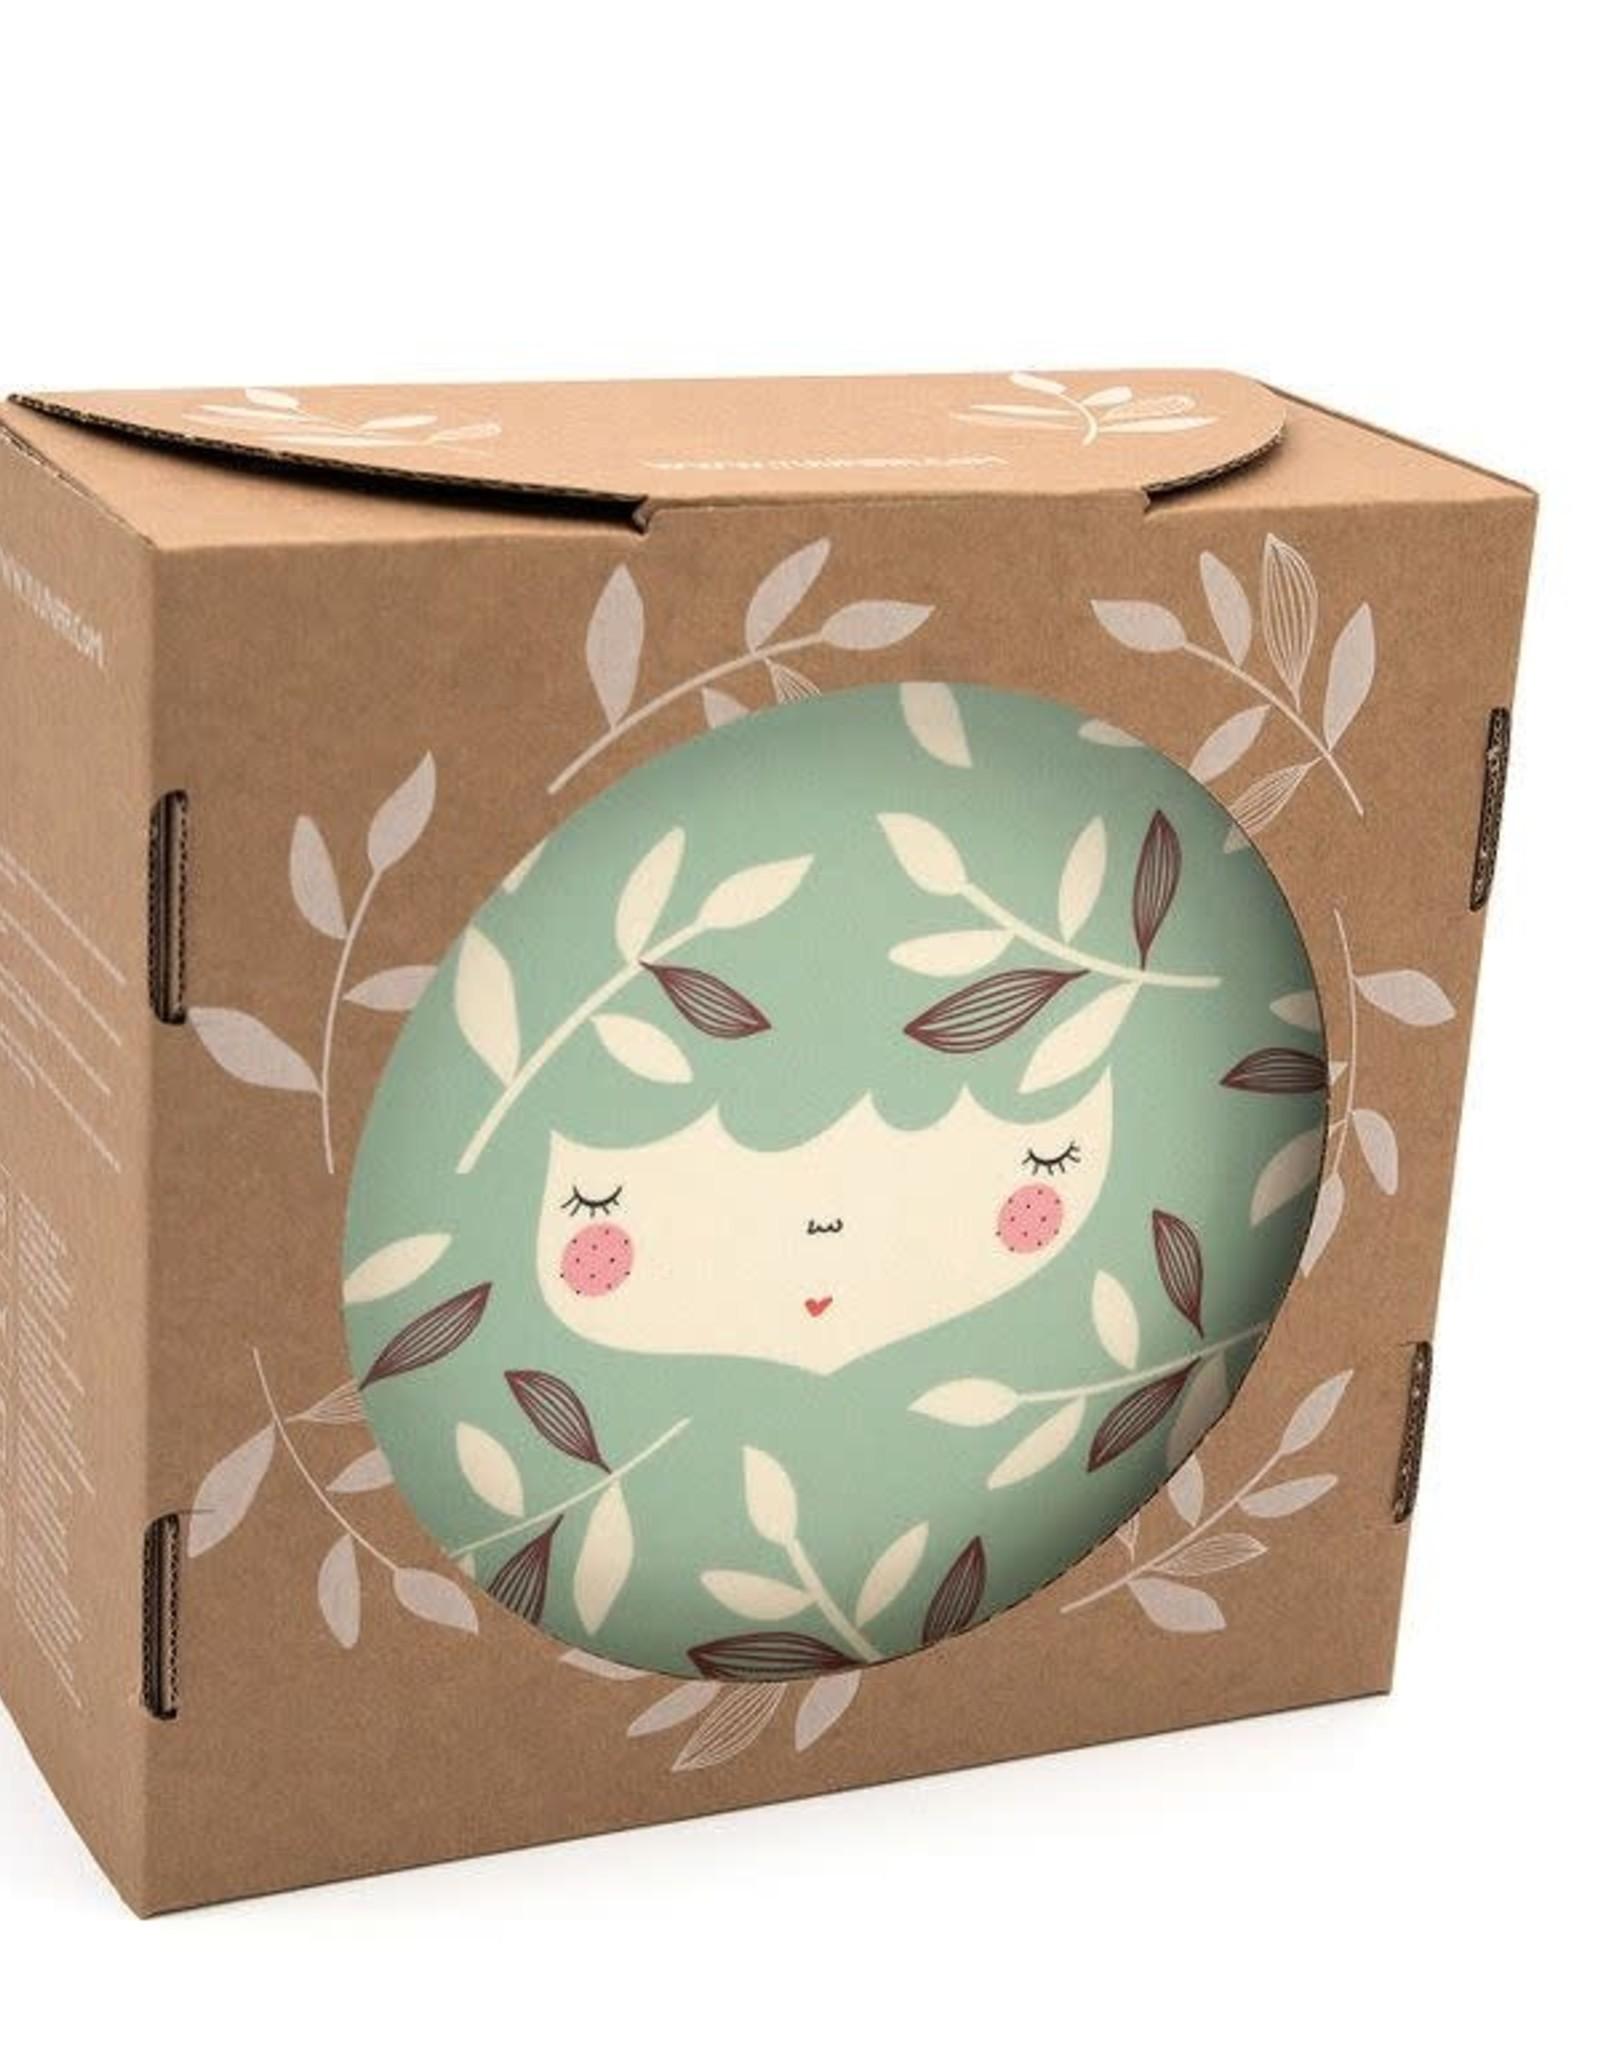 Yuunaa Bamboo Kids Set - Marinska Flower Face Mint - 3 pieces